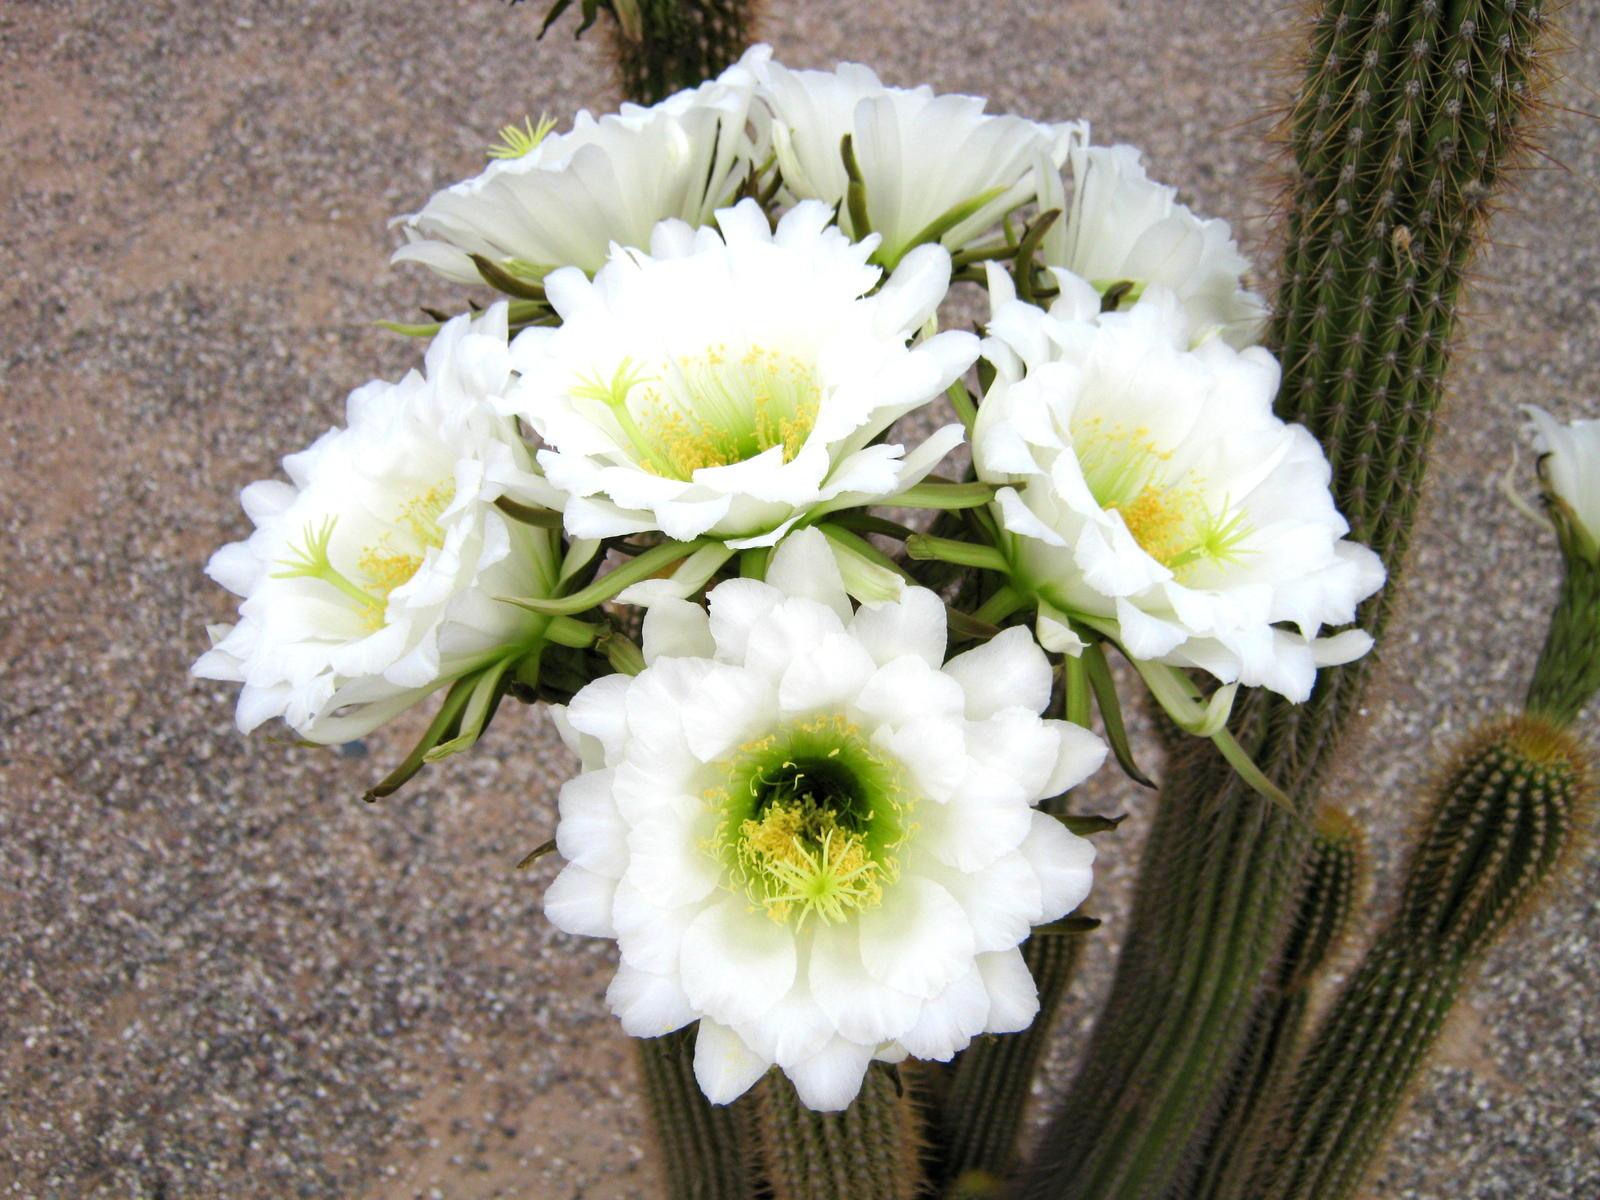 Cactus Flowers home camera good Tucson Arizona AZ City Data Forum